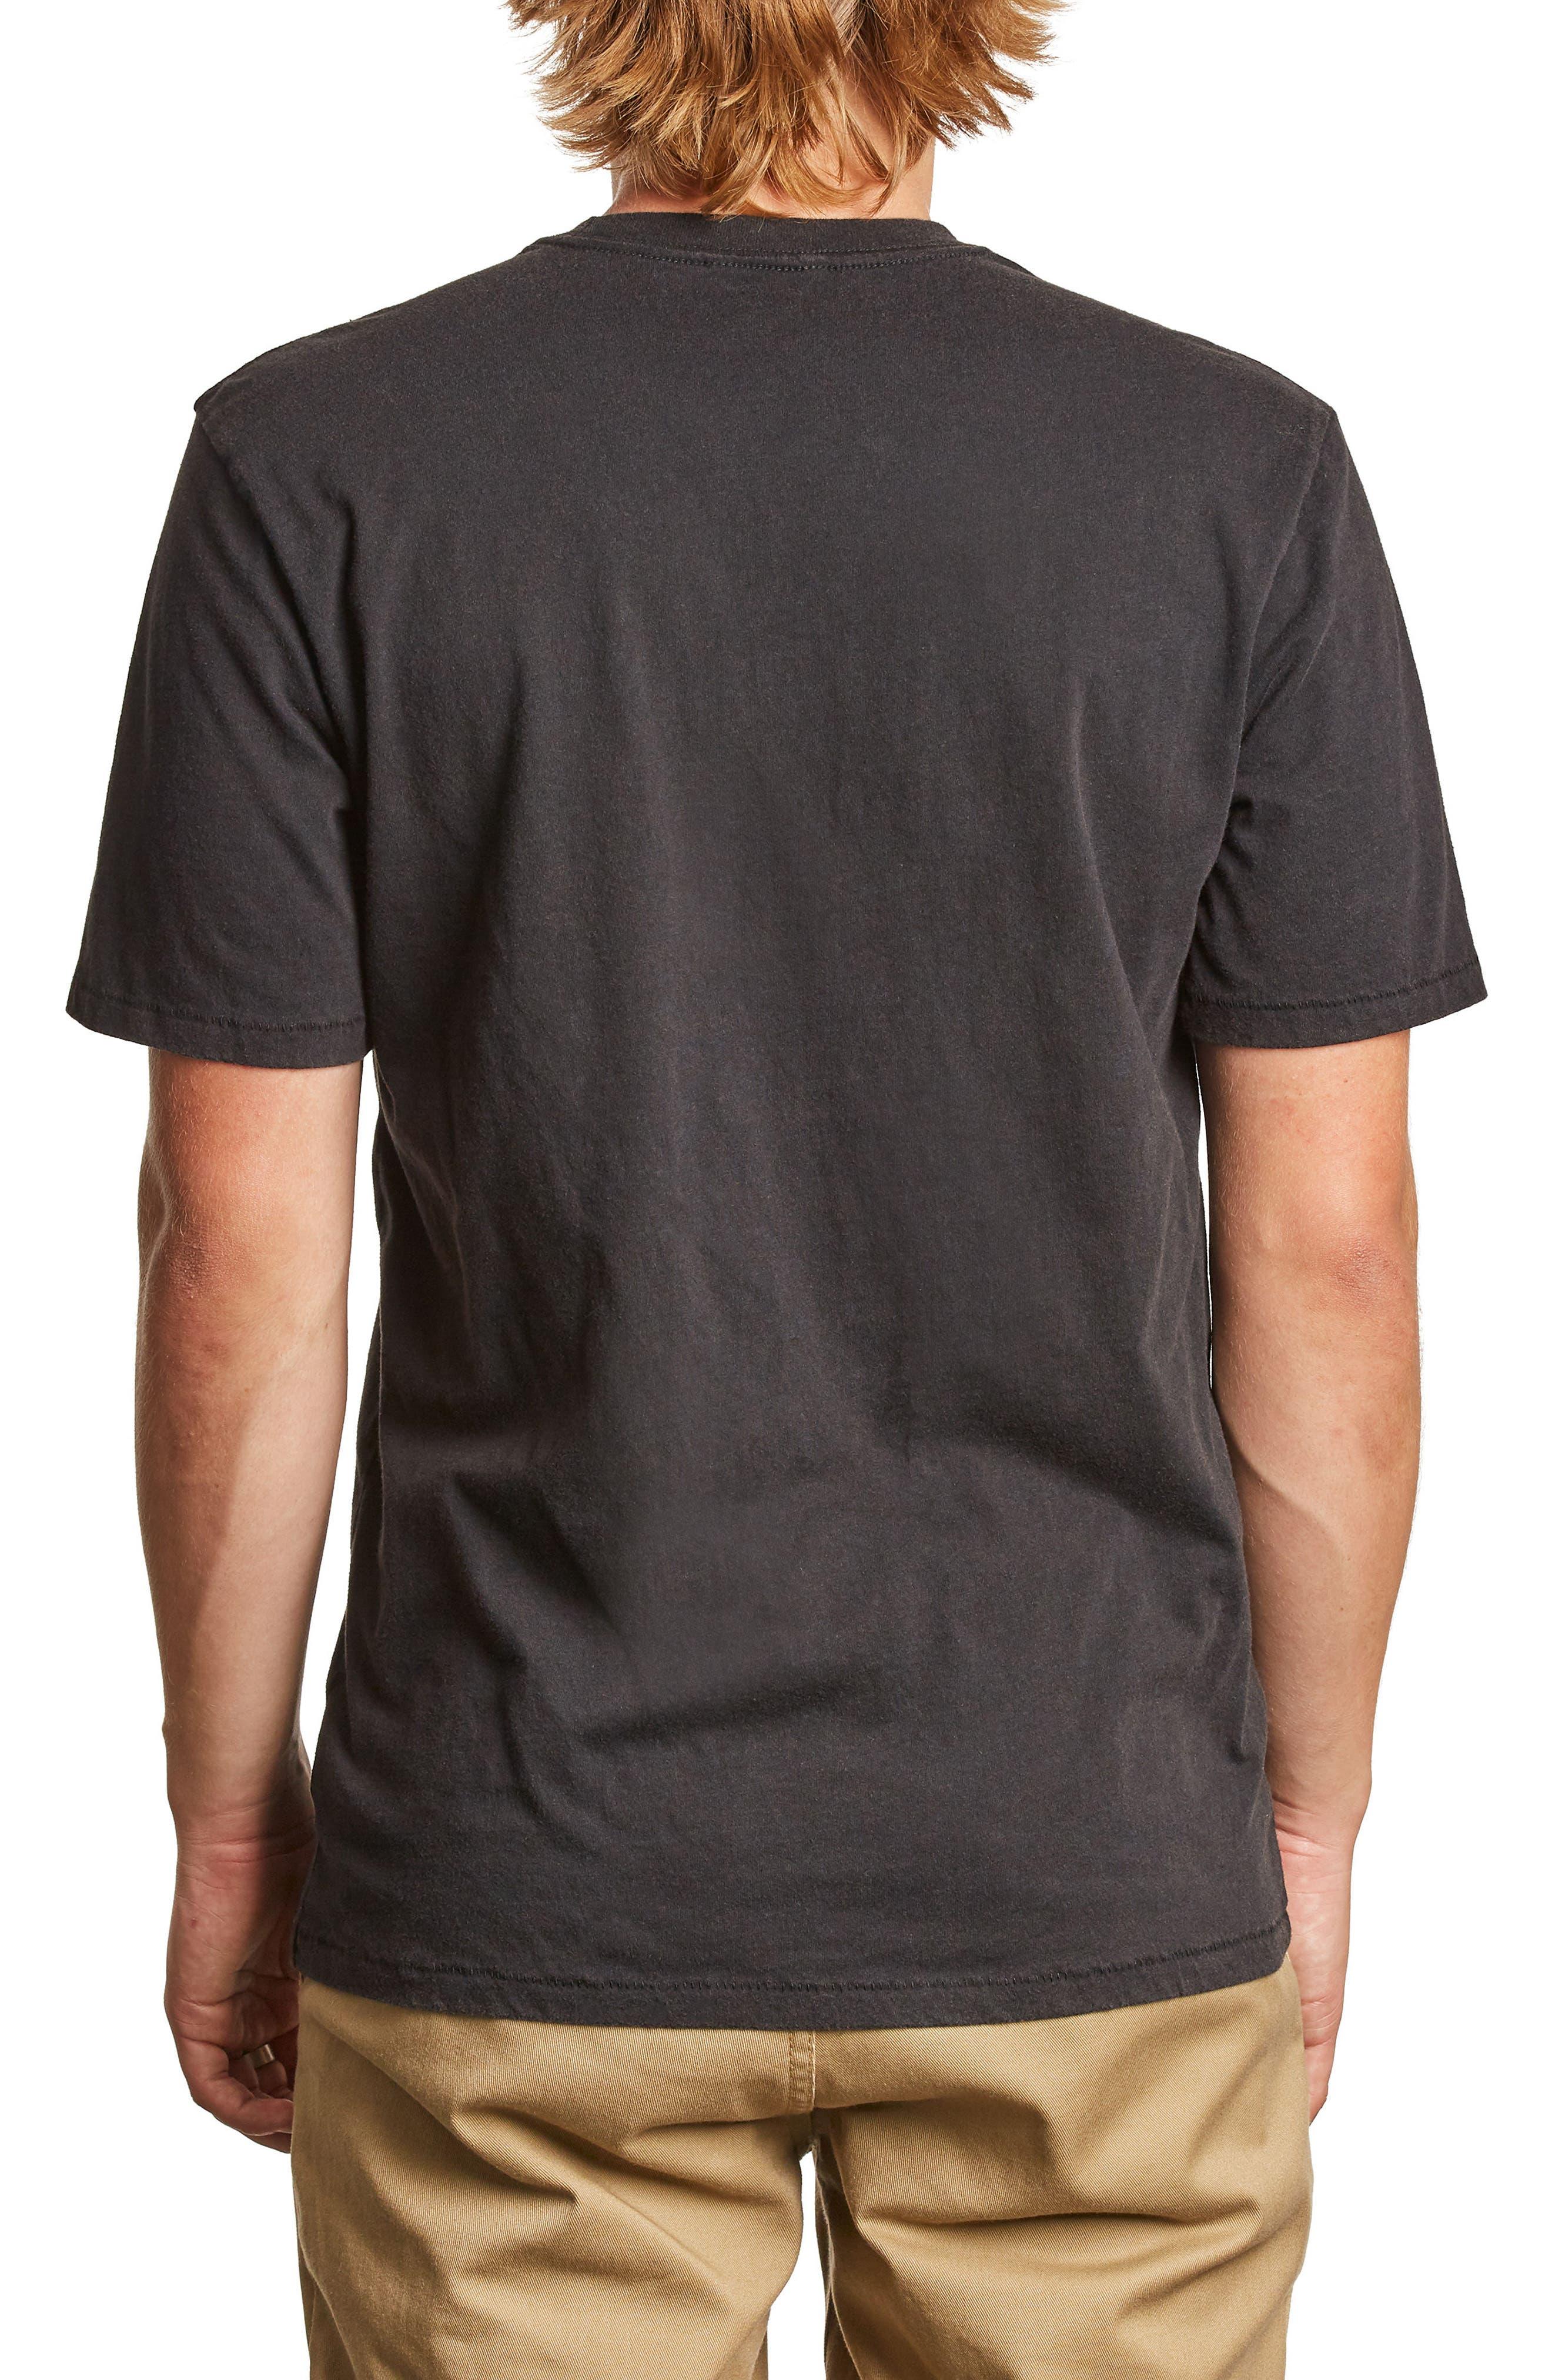 x Coors Filtered Pocket T-Shirt,                             Alternate thumbnail 2, color,                             Washed Black